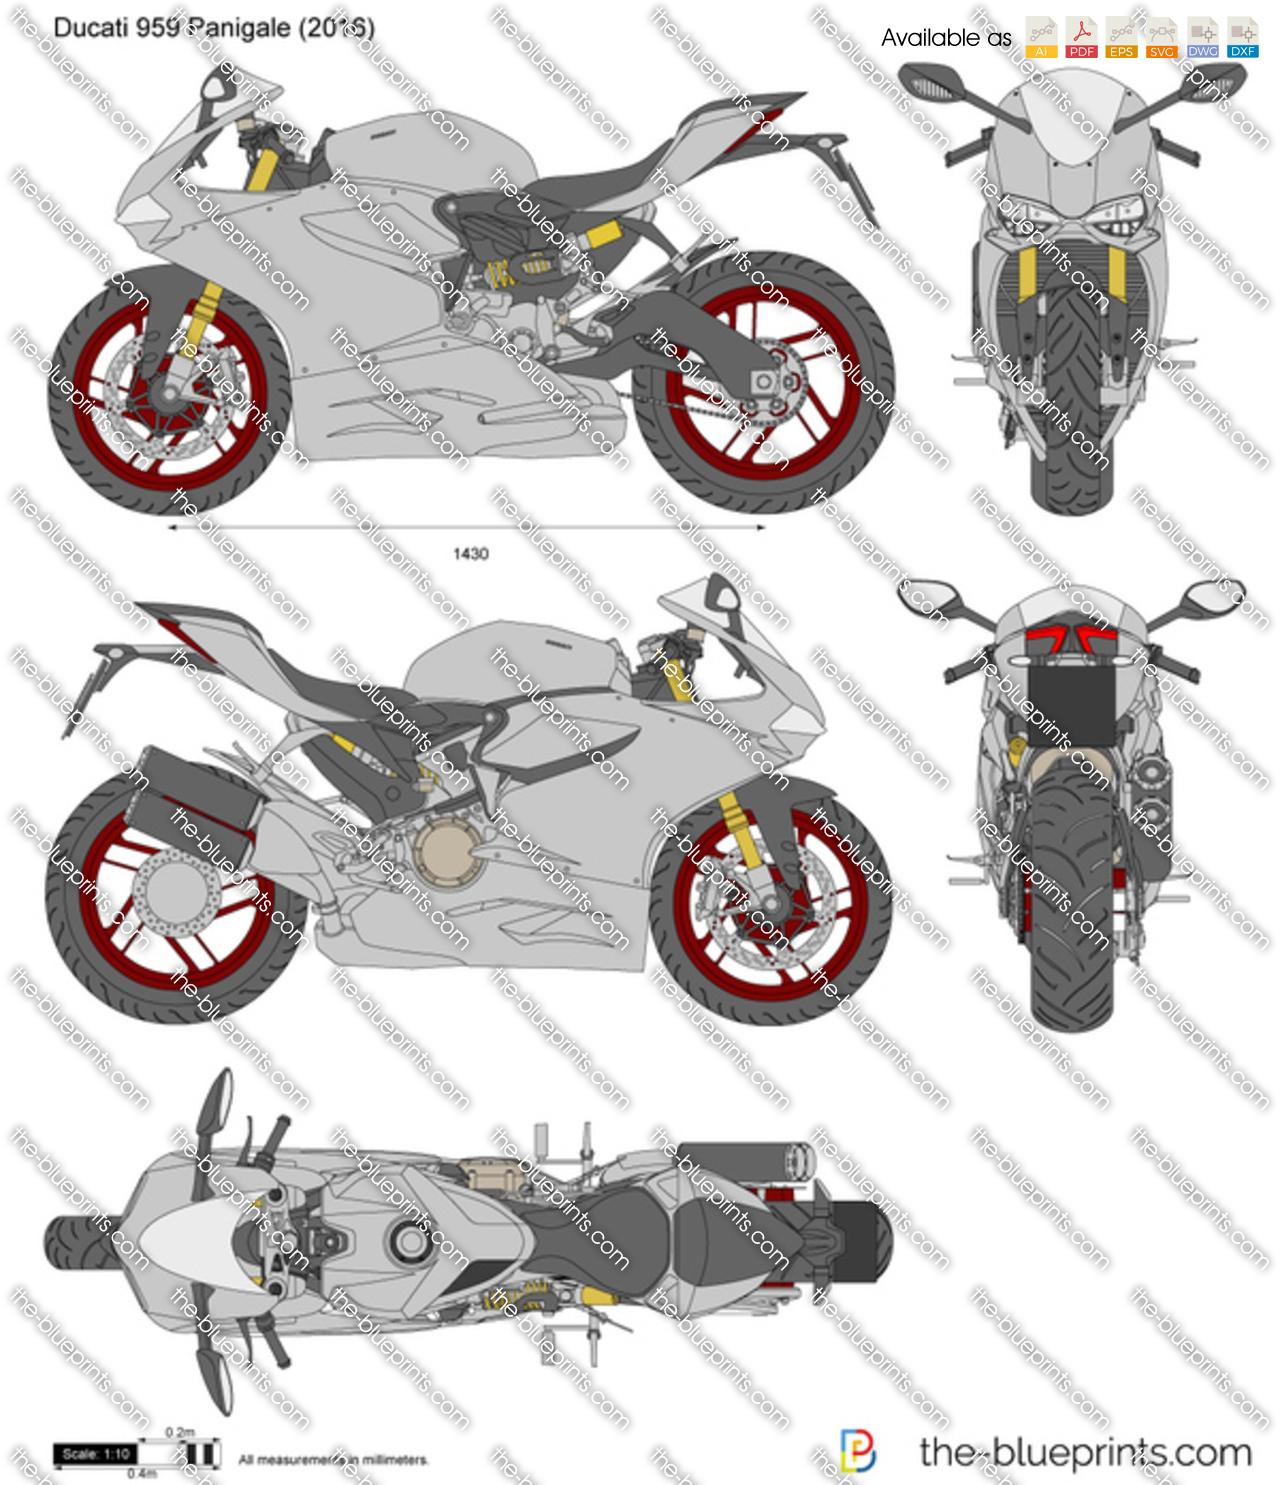 Ducati 959 Panigale 2019